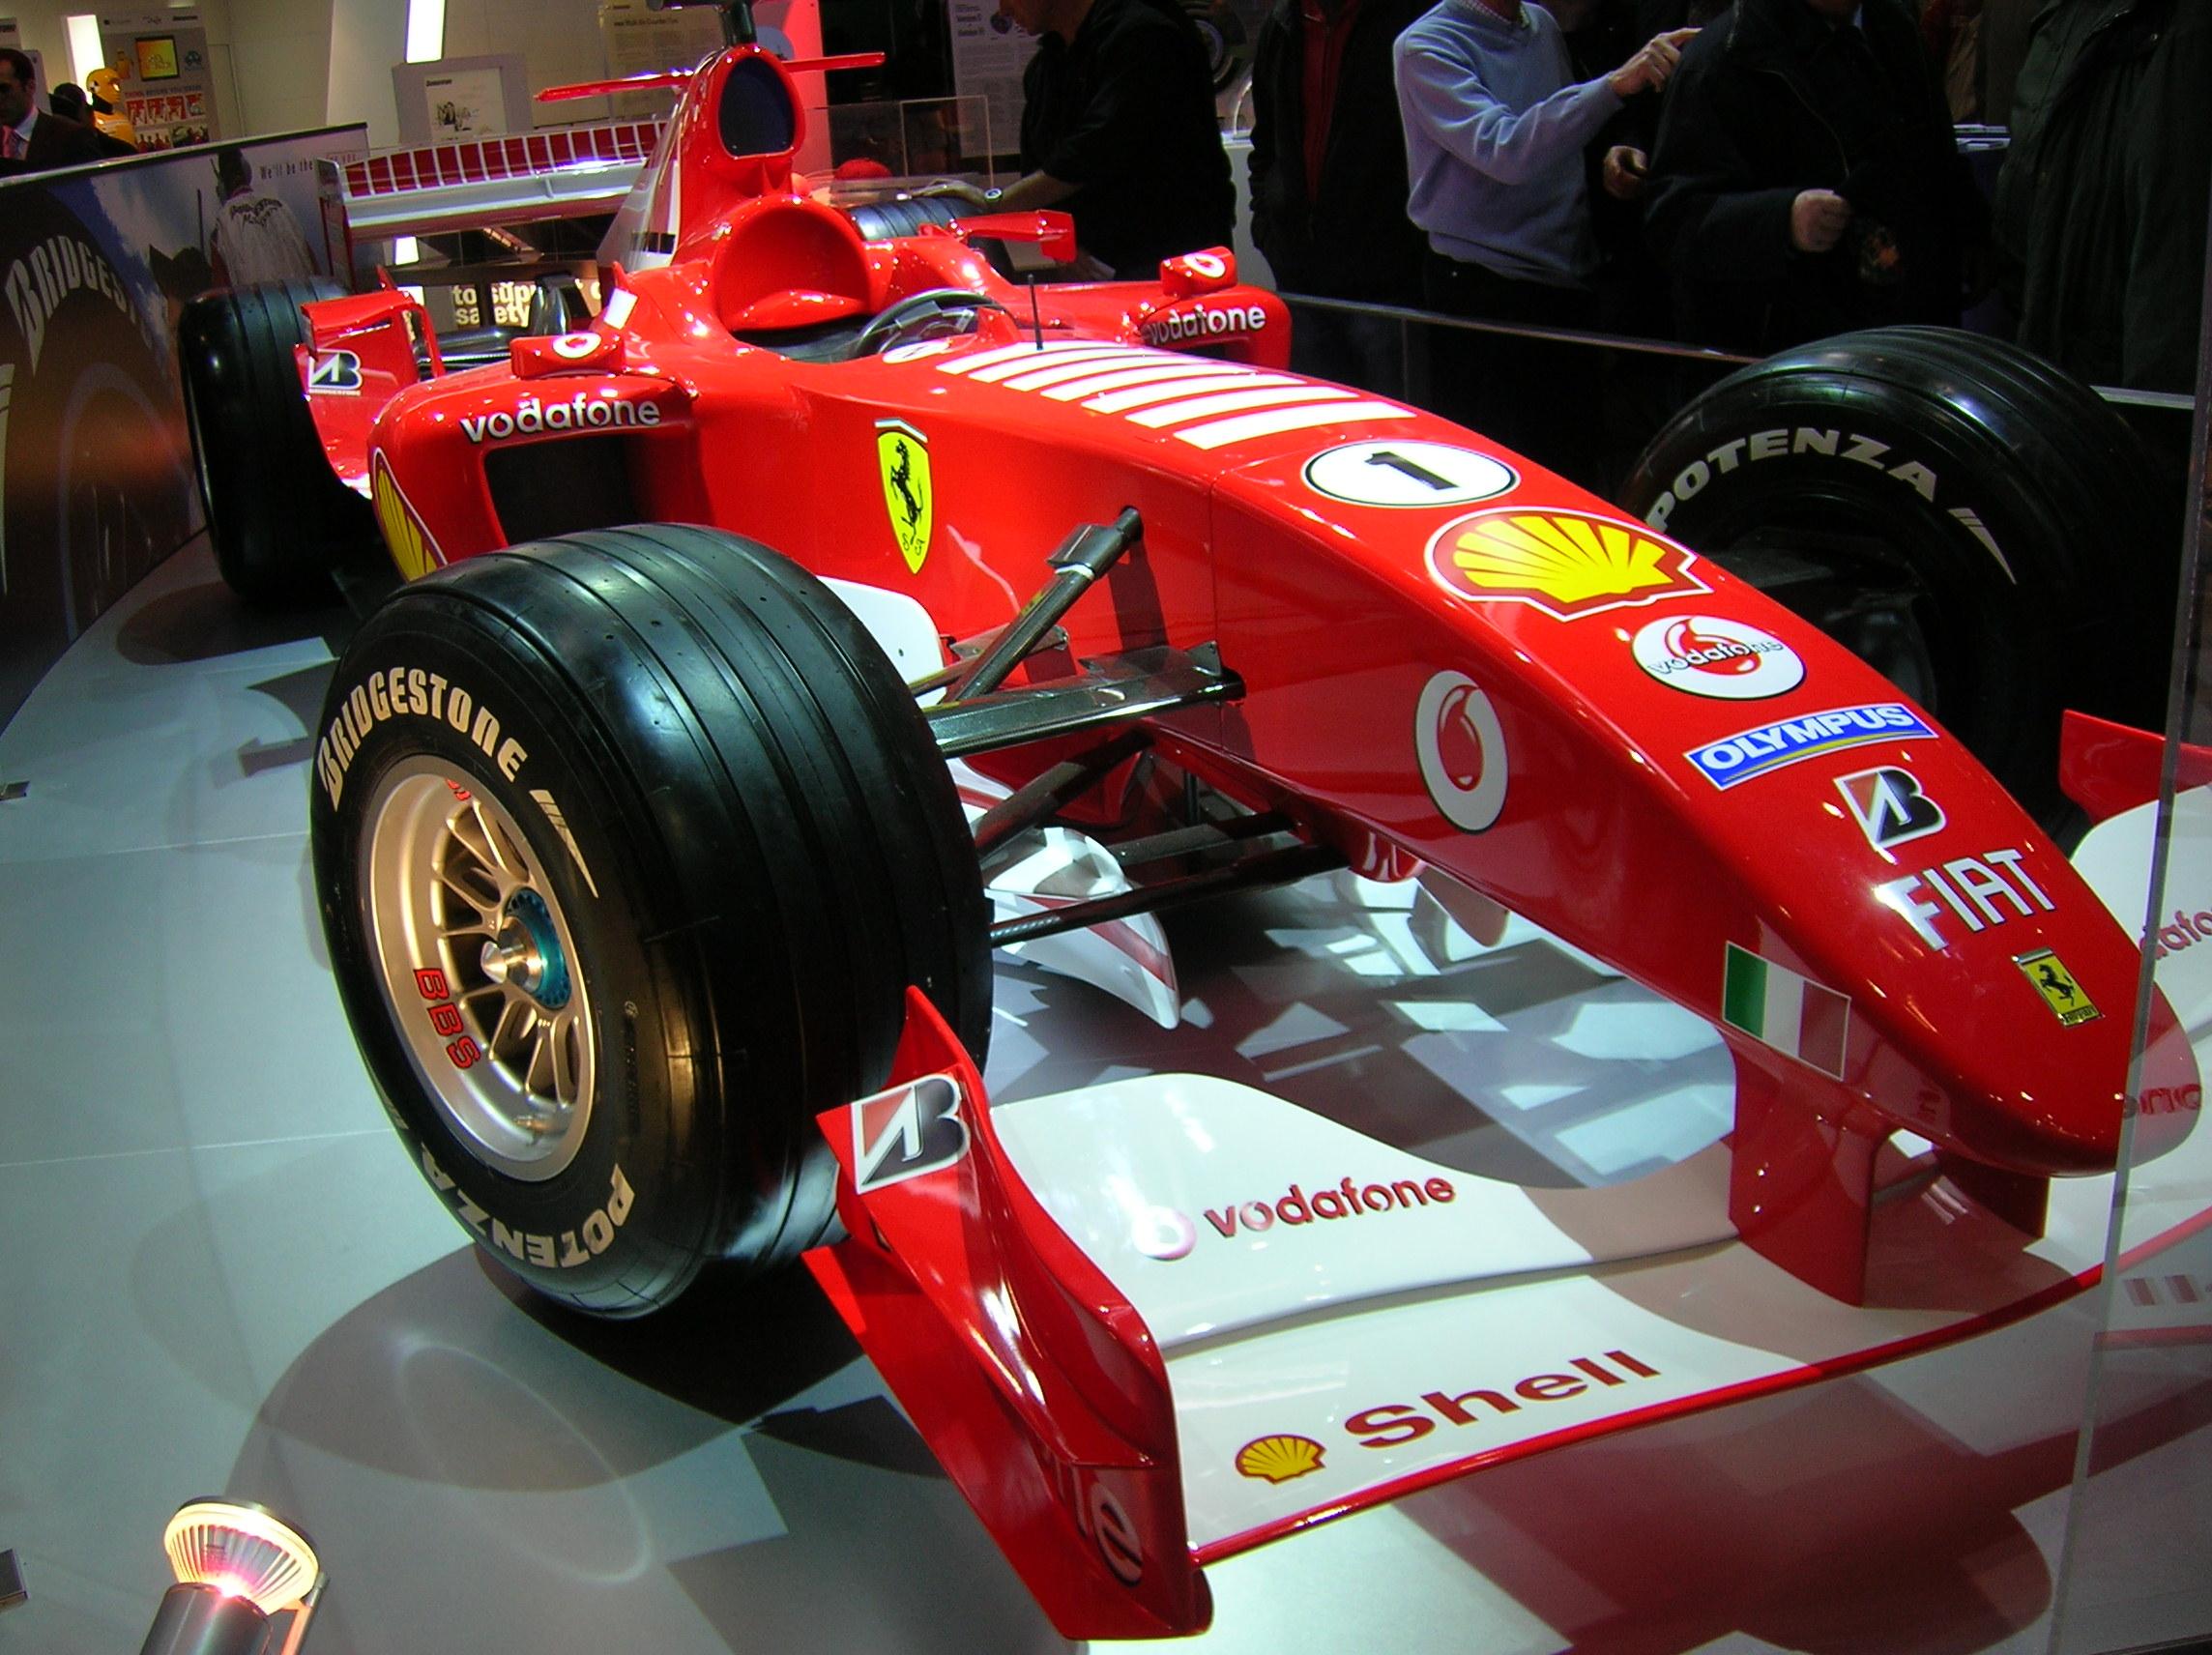 2006 Ferrari f1 Car File:2006 Sag f1 Ferrari